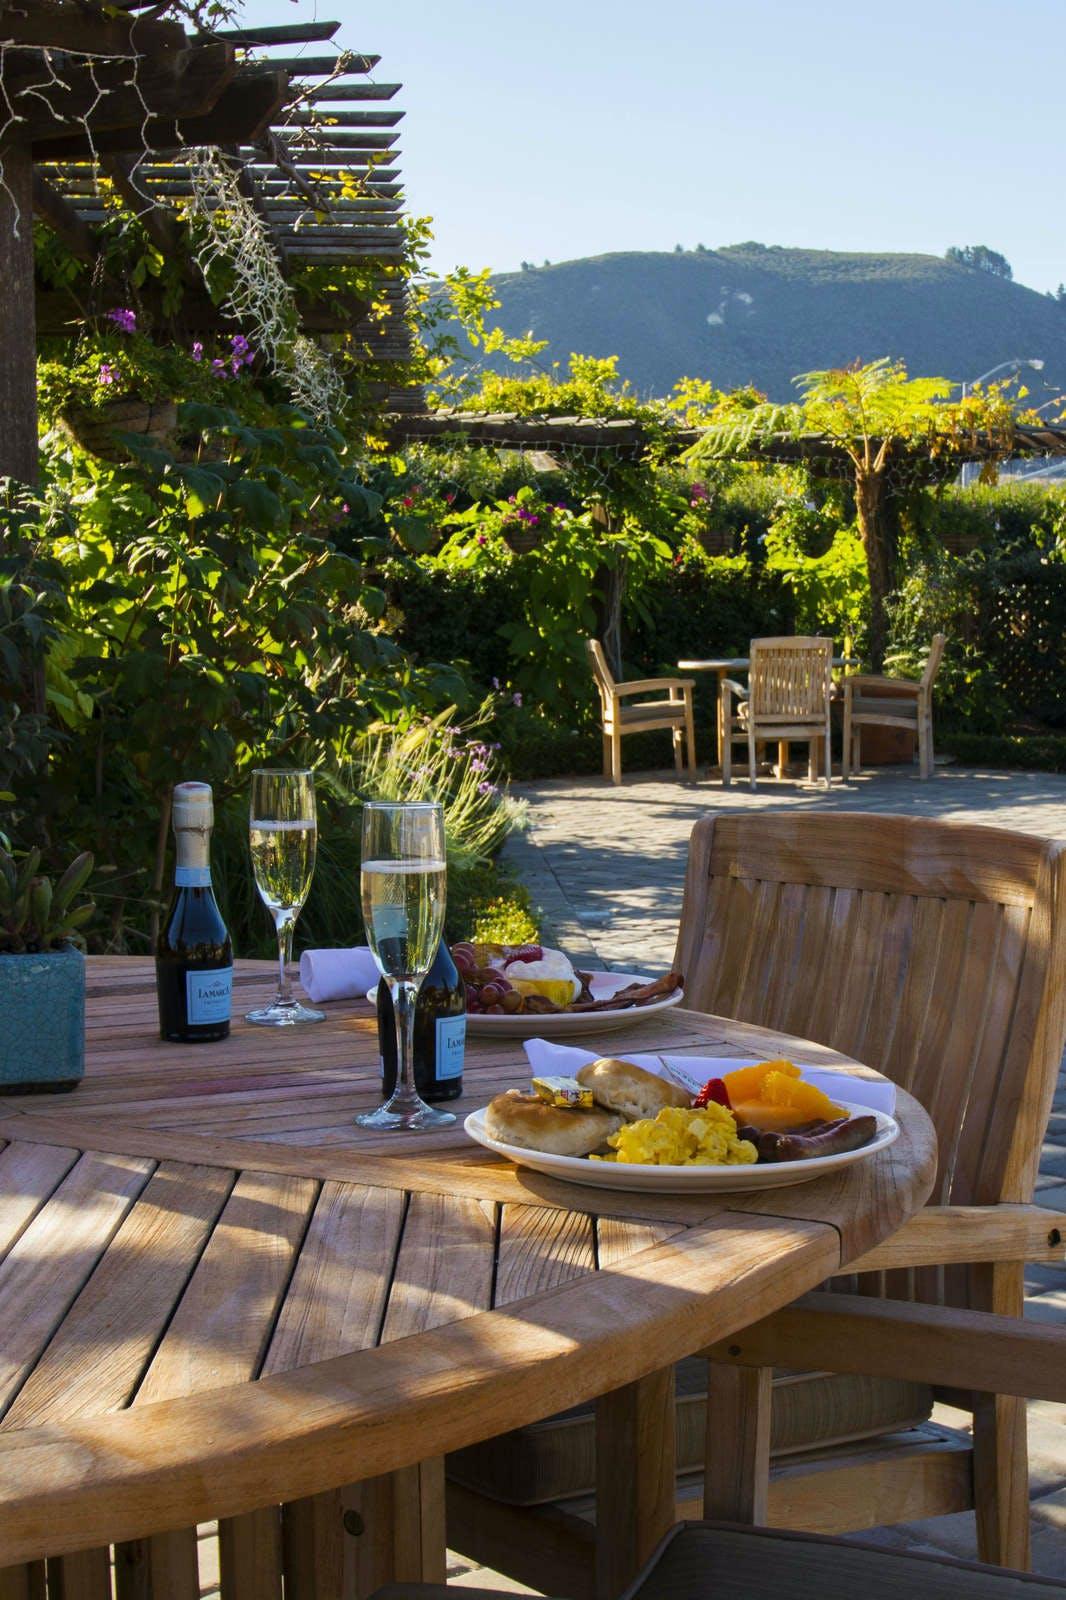 Carmel Mission Inn & Fuse Lounge Cafe